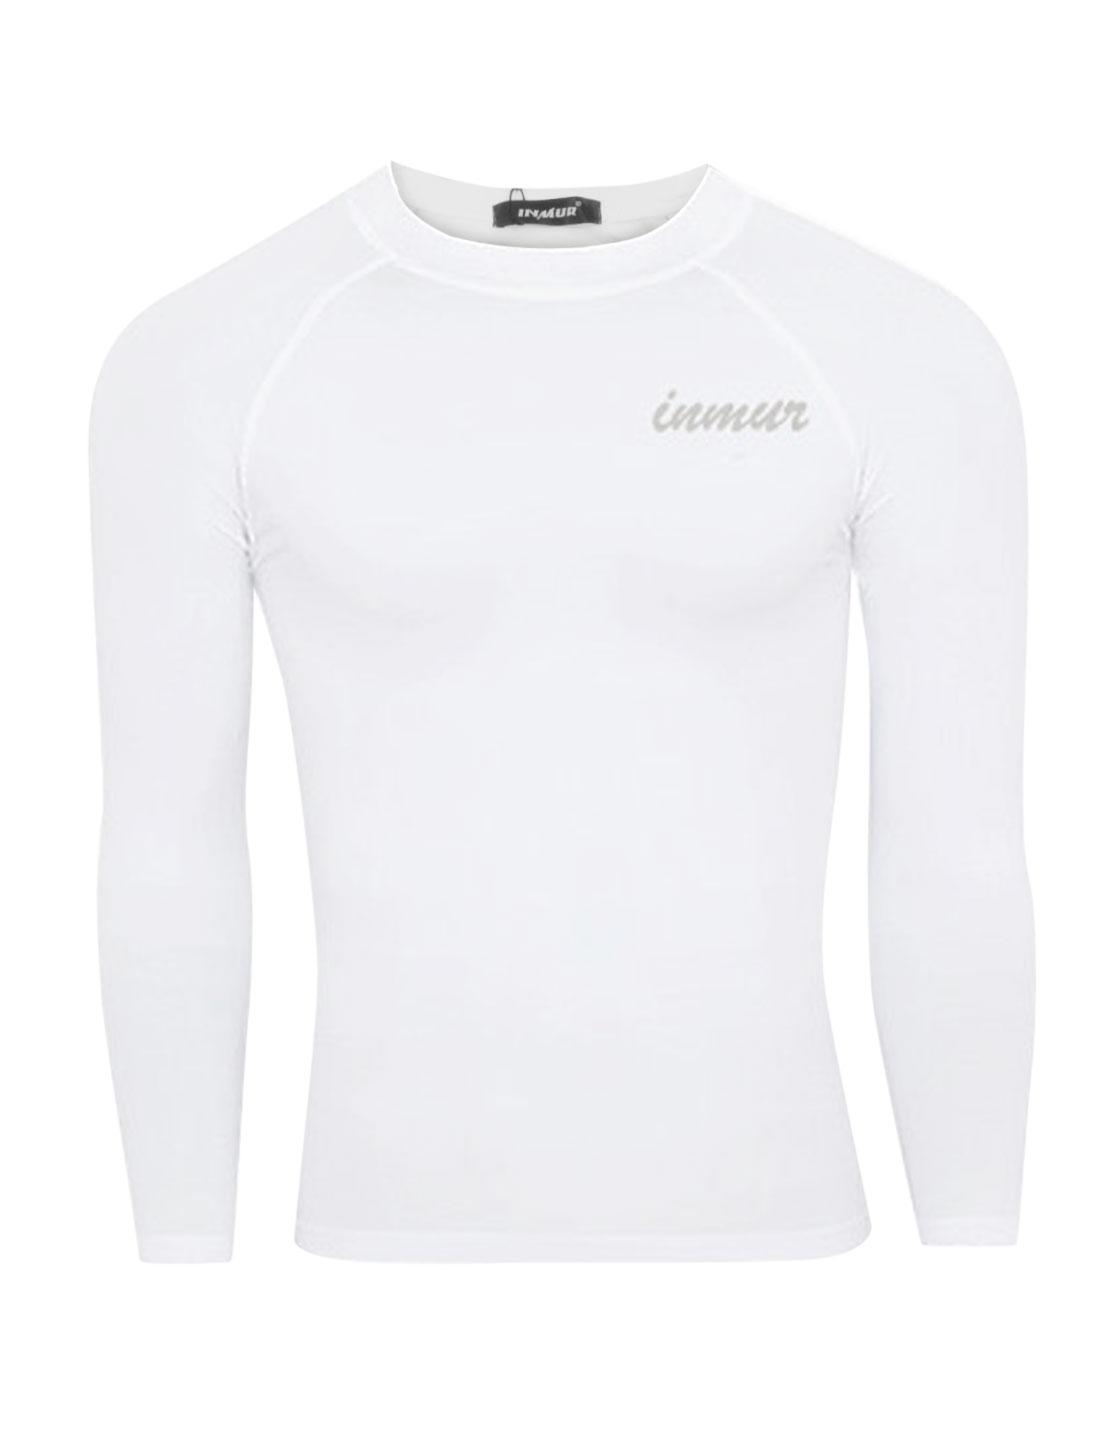 Men Pullover Round Neck Letters Detail Soft Sport Shirt White M